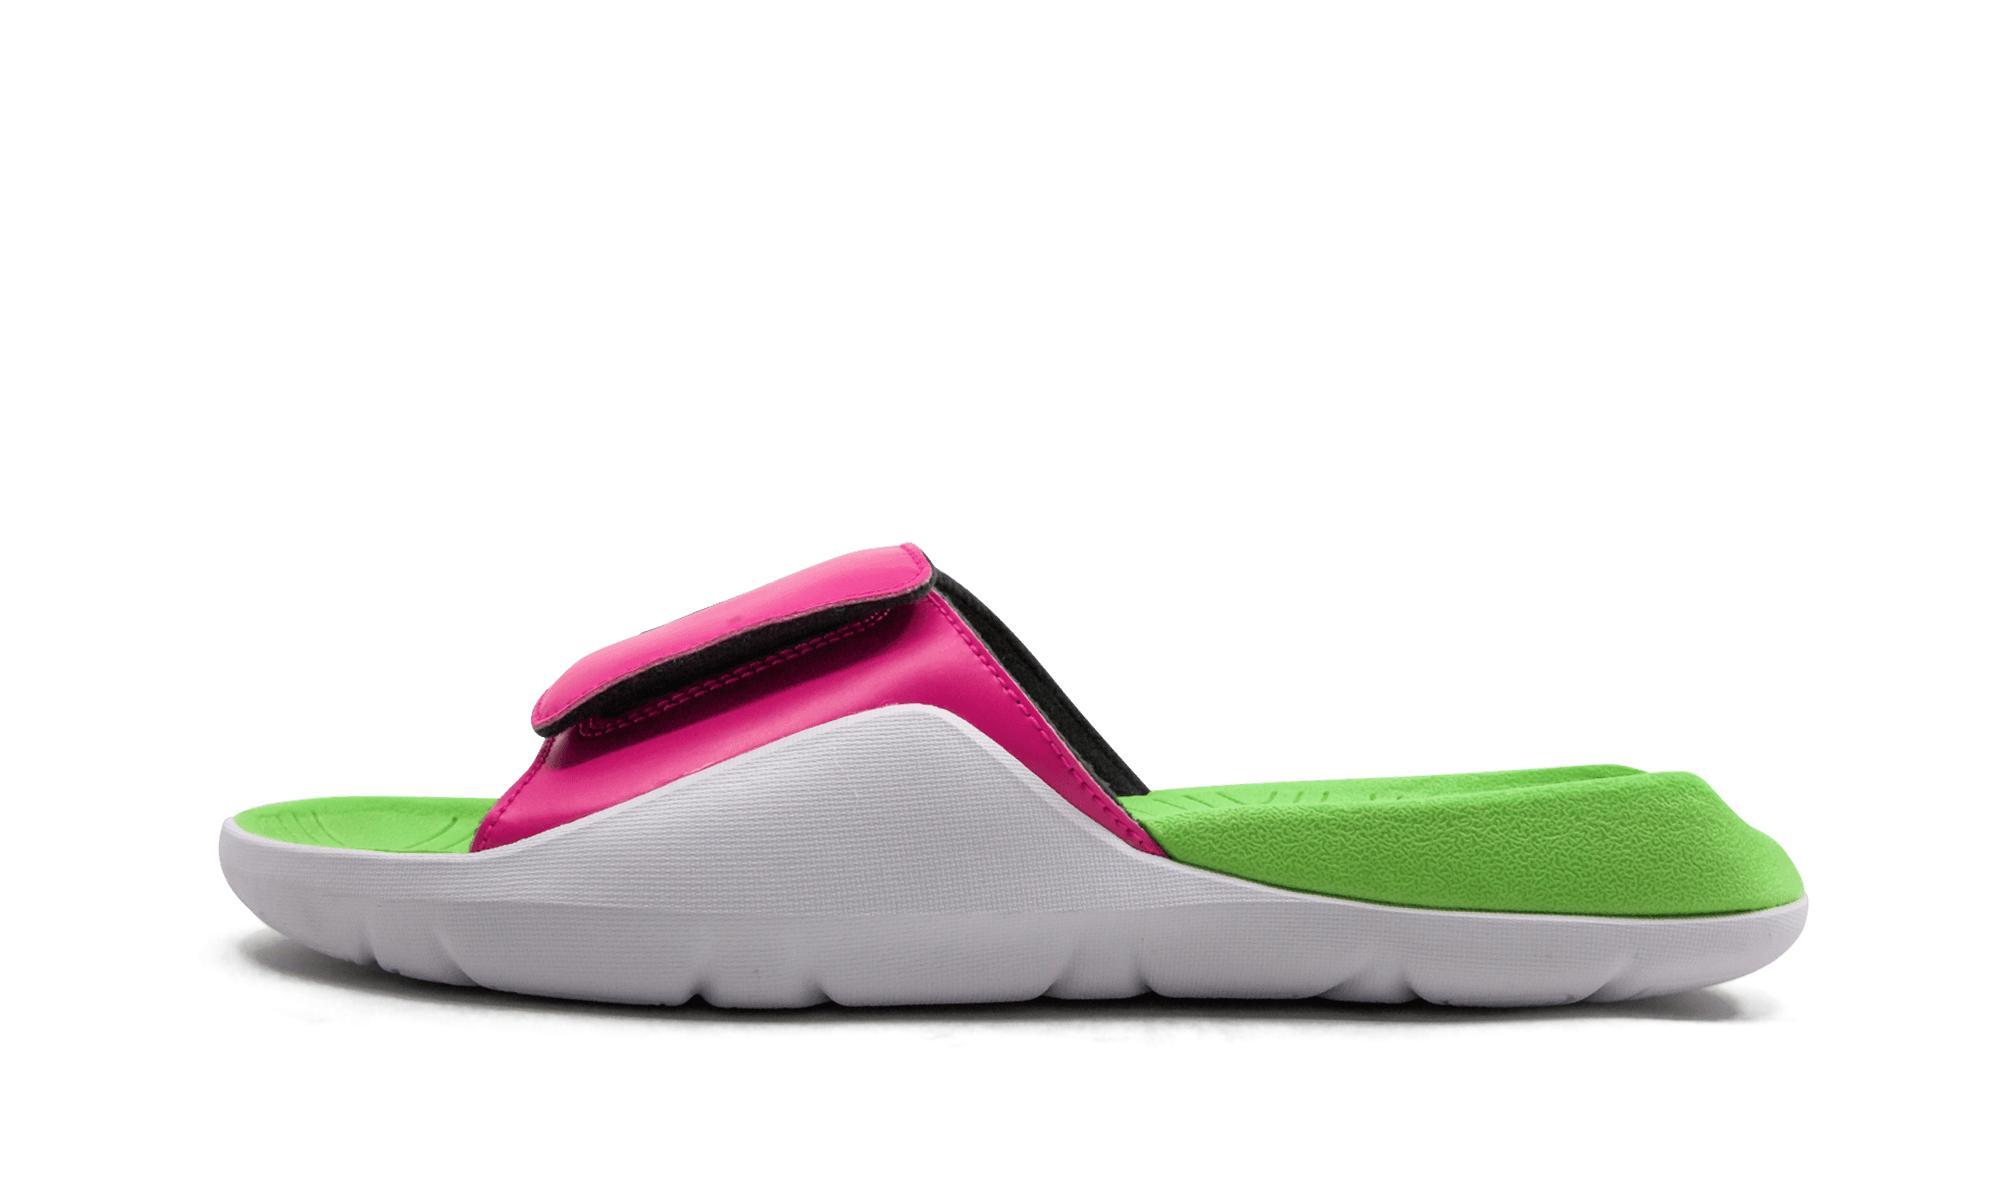 e4129853ac35 Nike - Blue Hydro 7 Q54 for Men - Lyst. View fullscreen